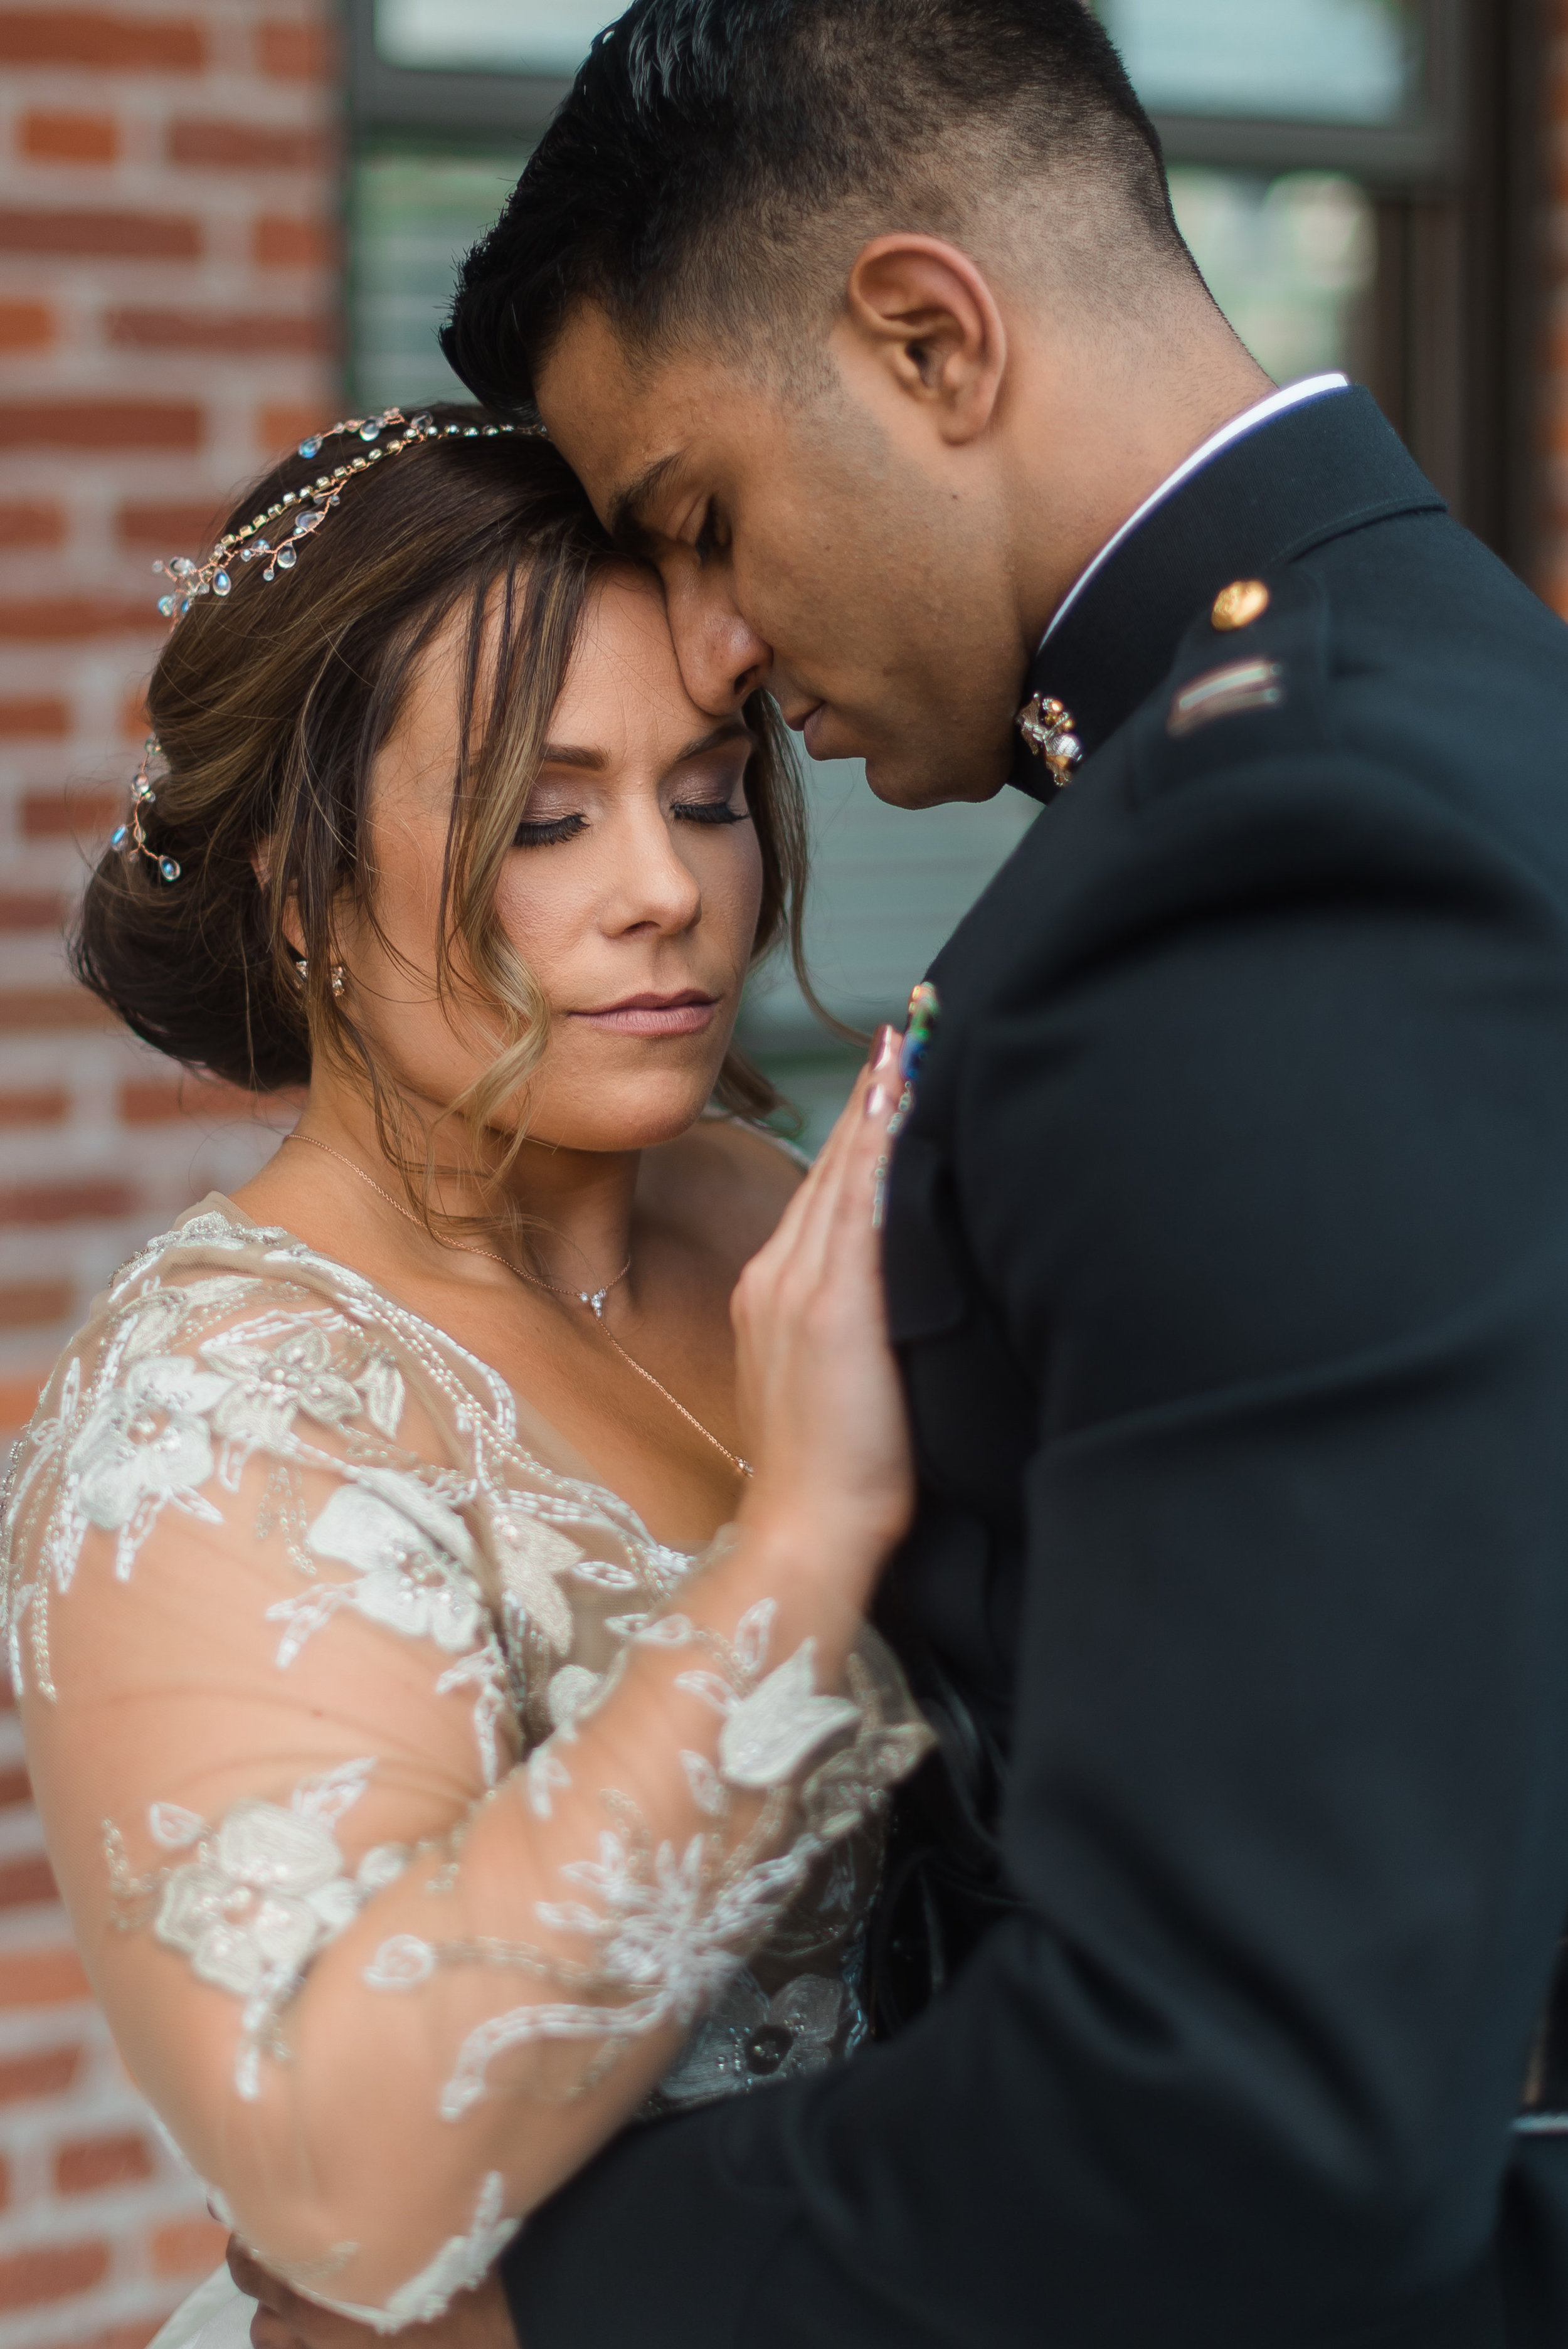 lancaster-wedding-photographer-corkfactory-hotel-industrial-glam-exposedbrick-hayleypaige0225.jpg